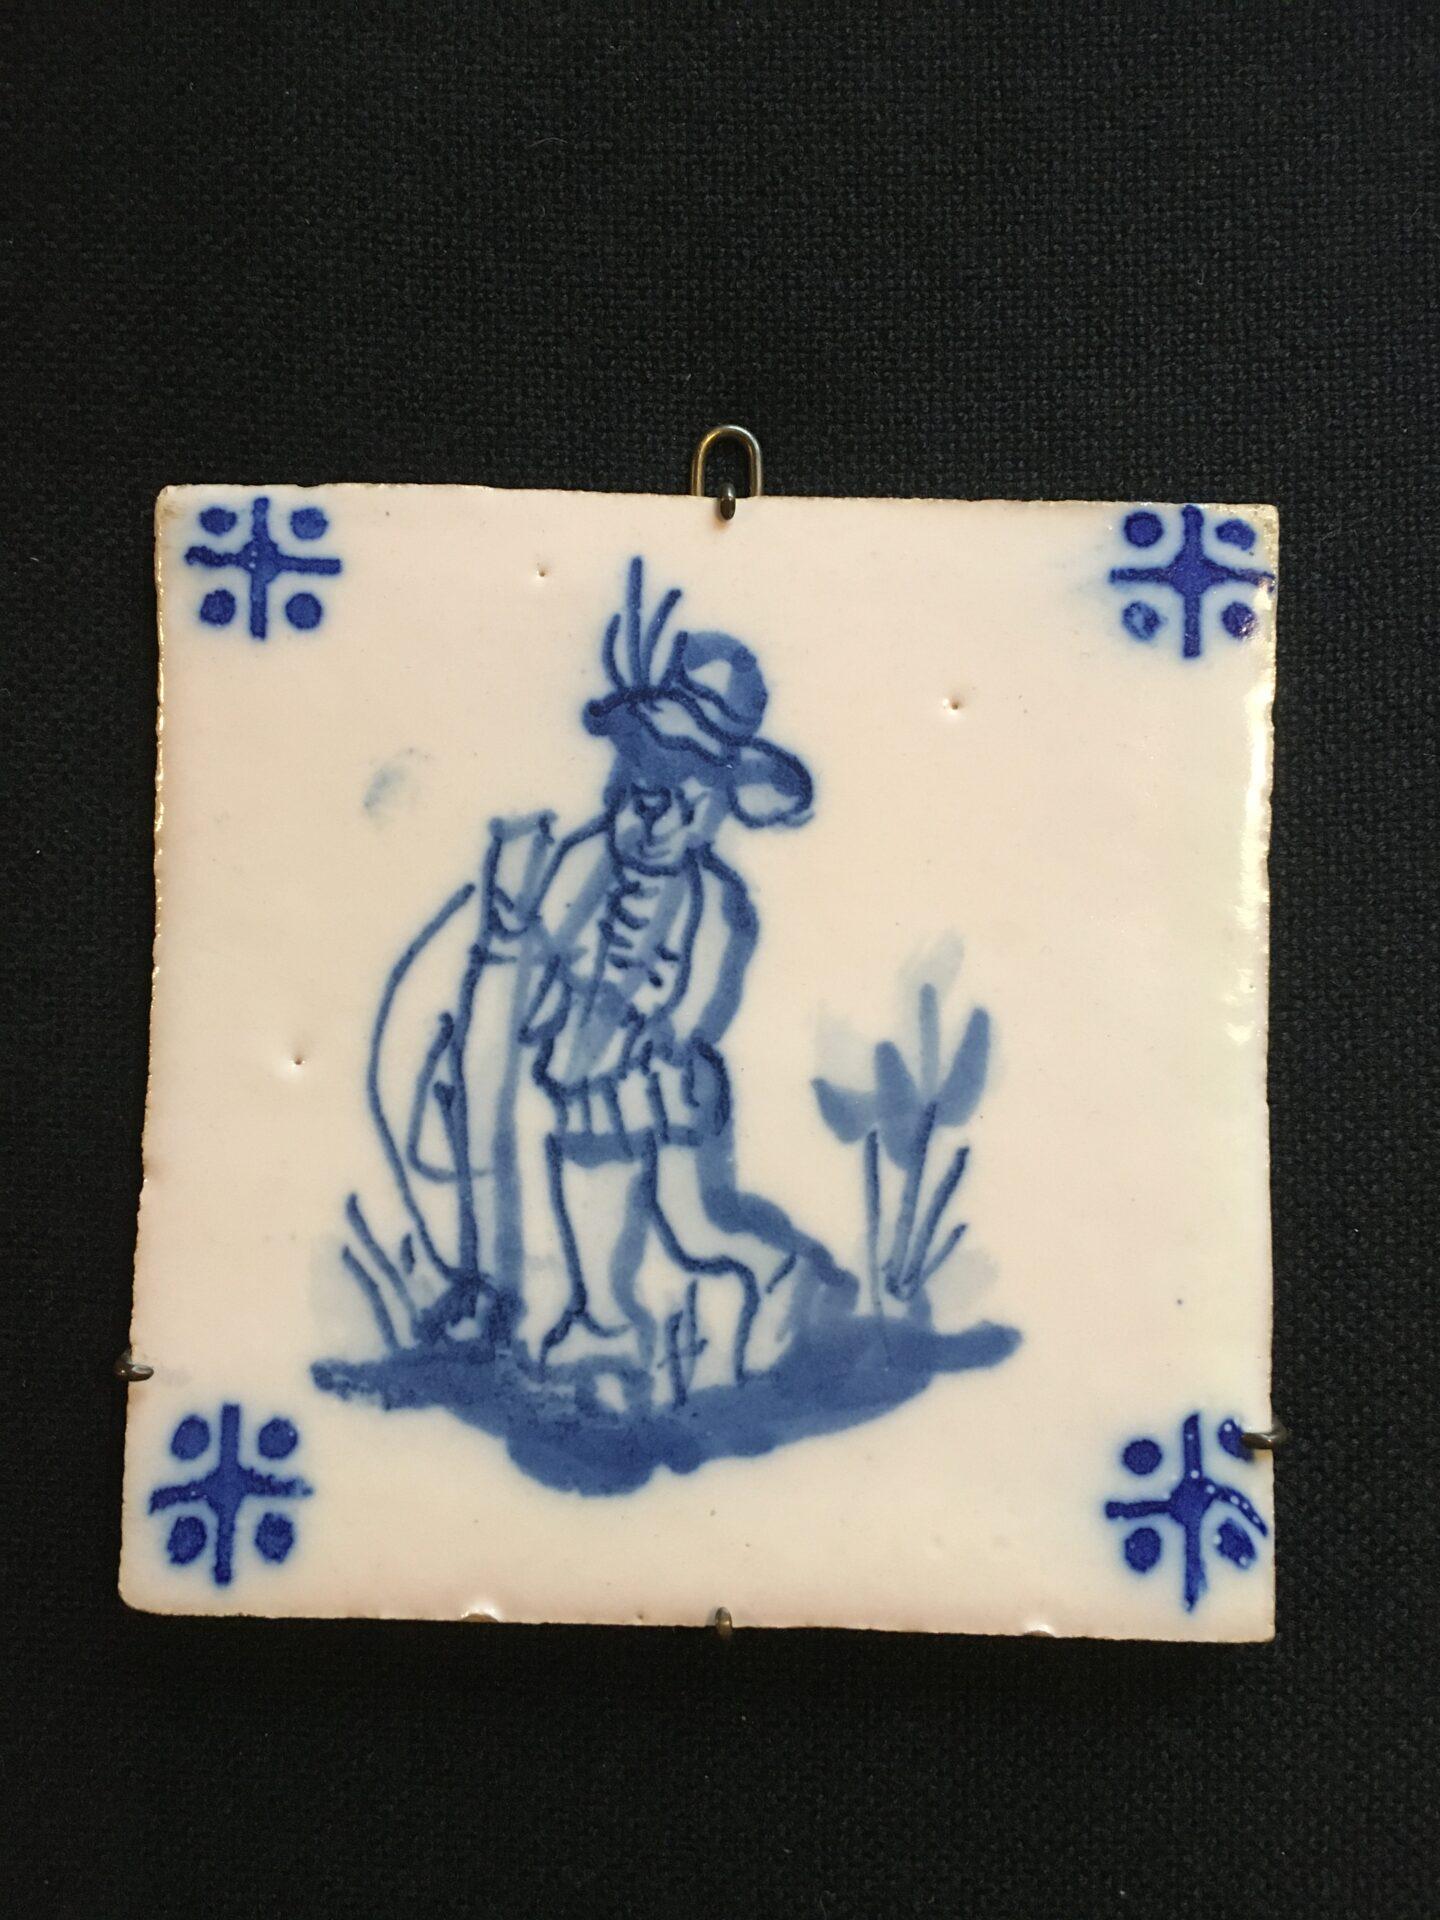 Antik Hollandsk flise, ca 14x14 cm, pris 200 kr